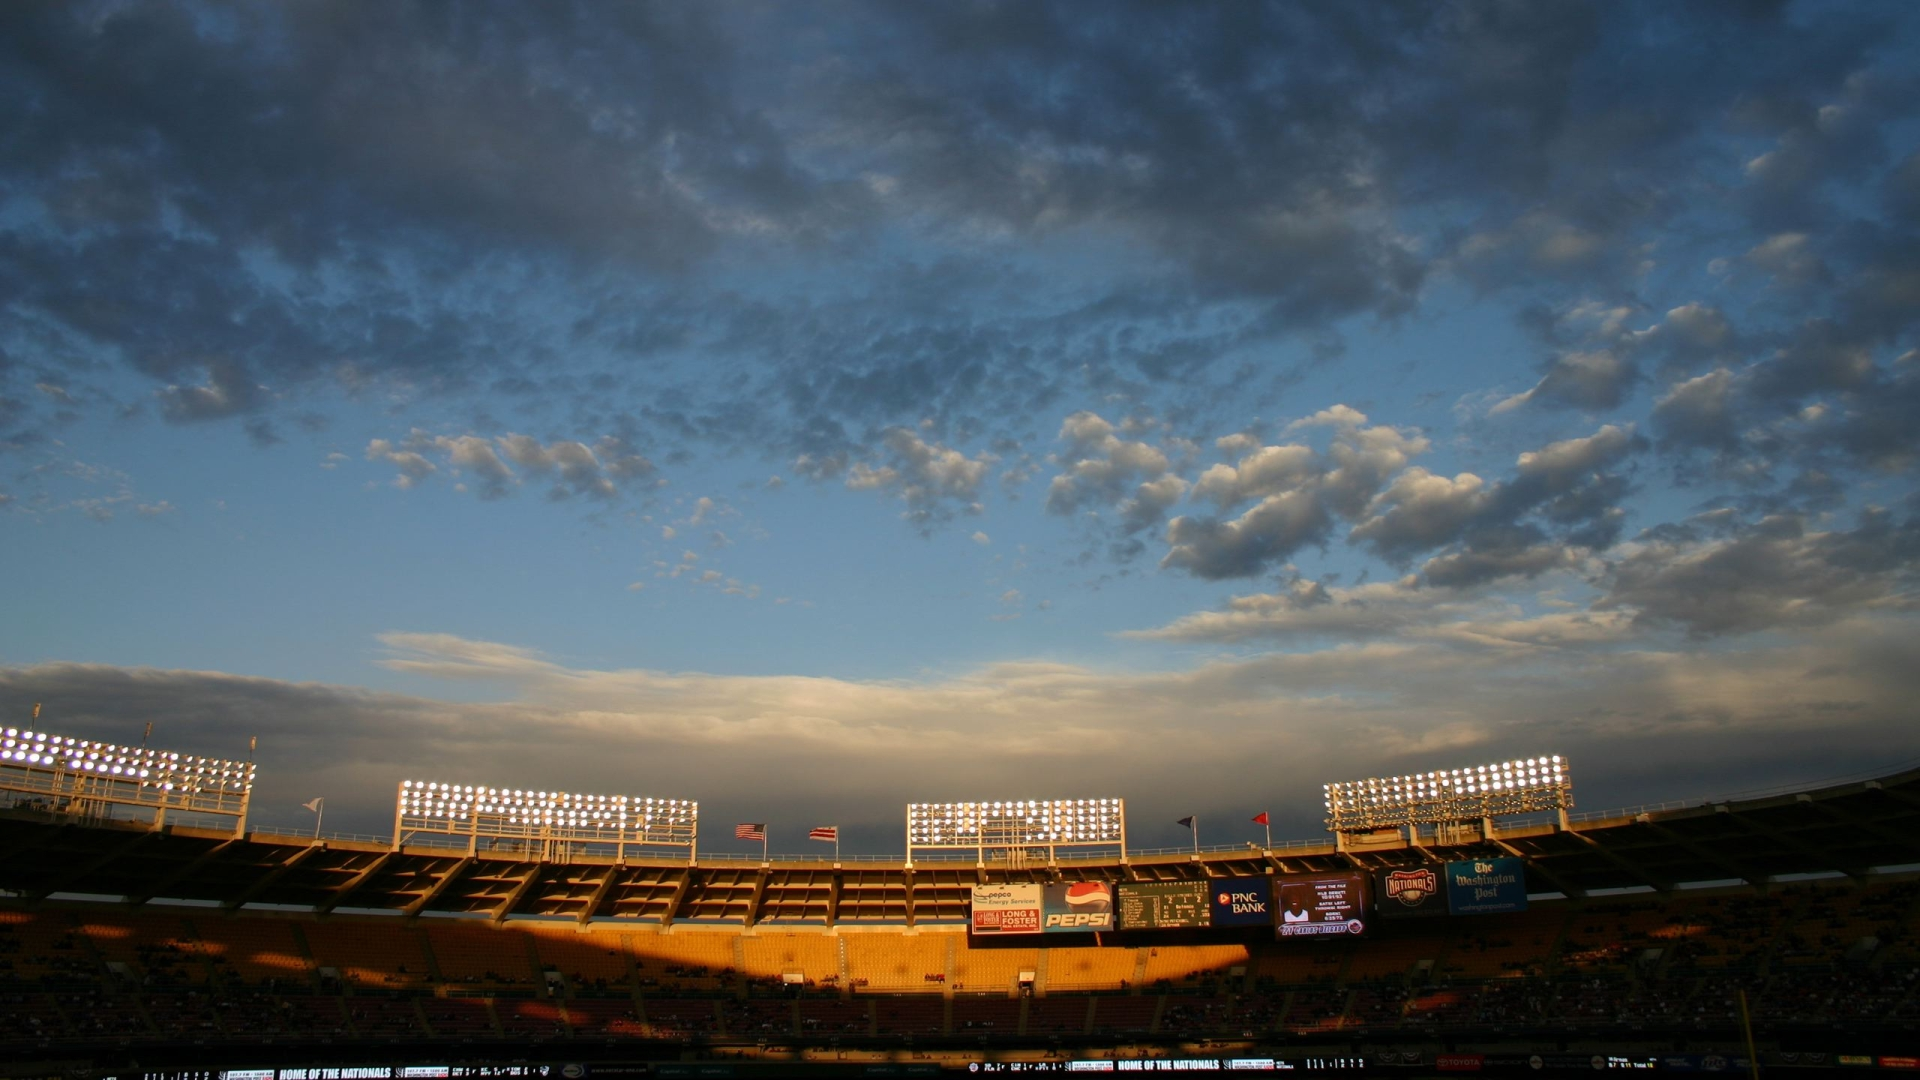 стадион, фонари, небо